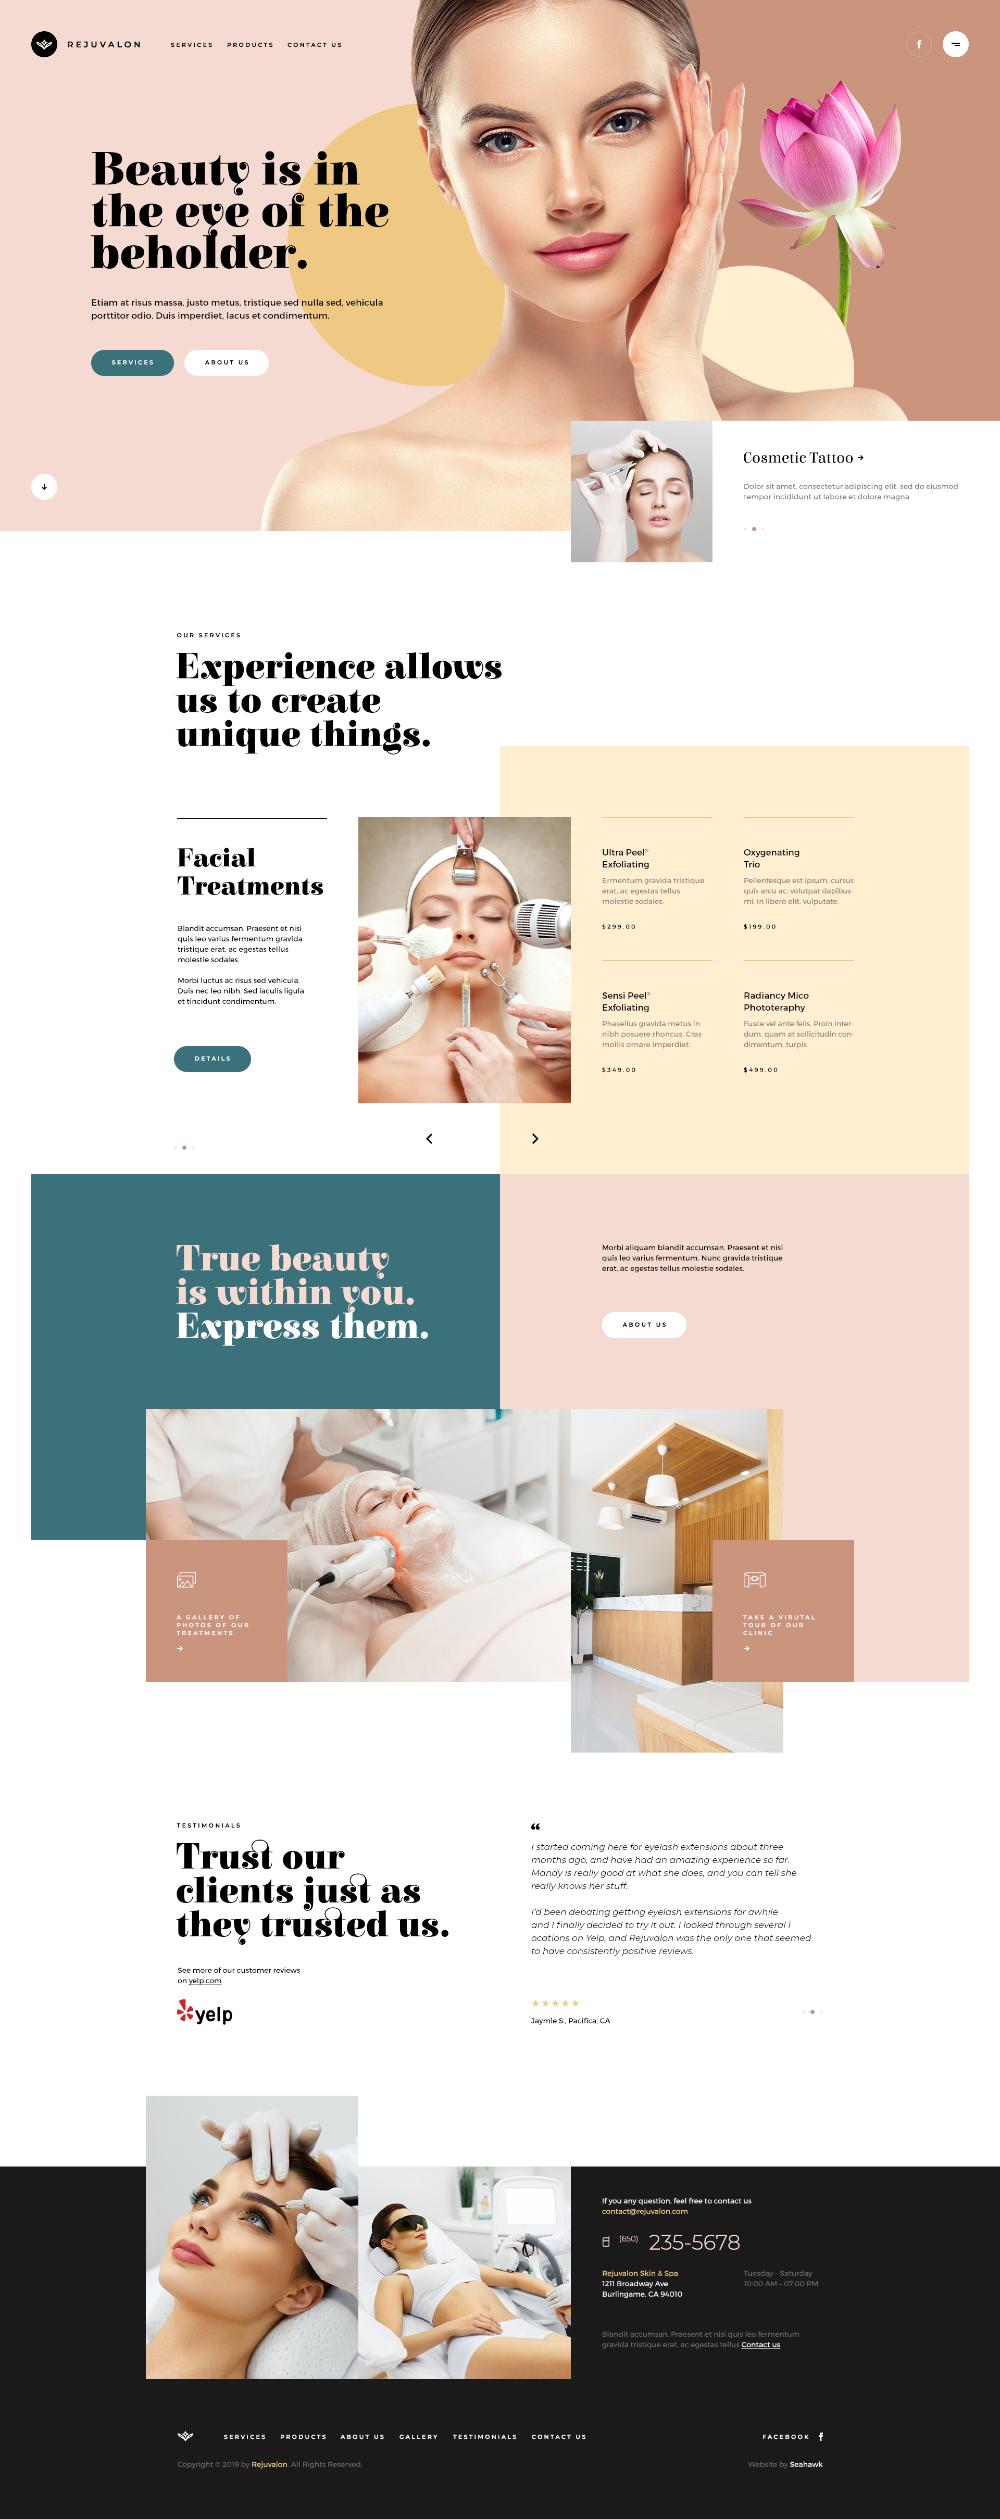 Rejuvalon 100 Png Web Layout Design Web Design Tips Cosmetic Web